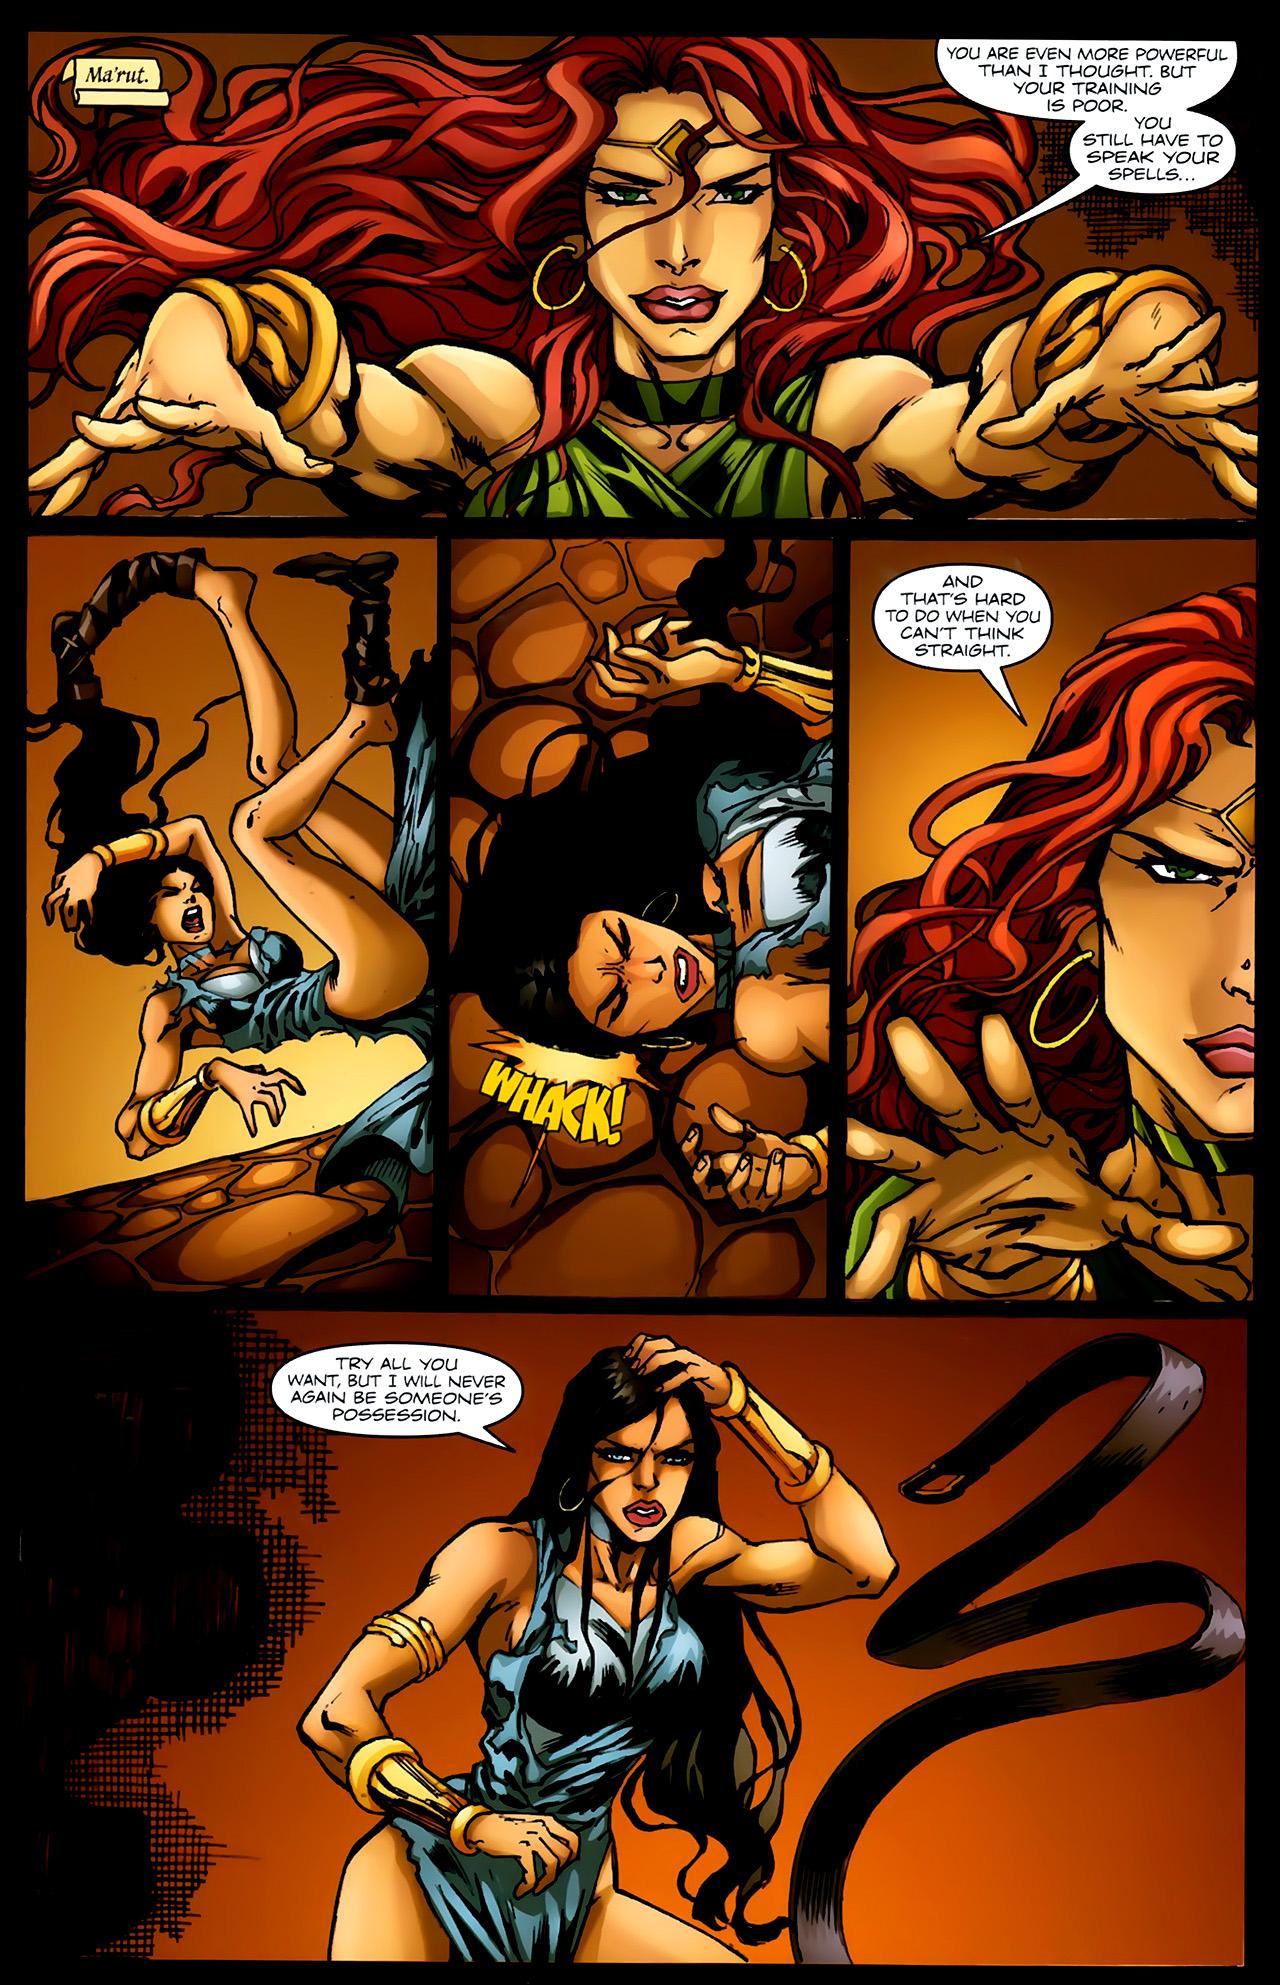 Read online 1001 Arabian Nights: The Adventures of Sinbad comic -  Issue #4 - 18